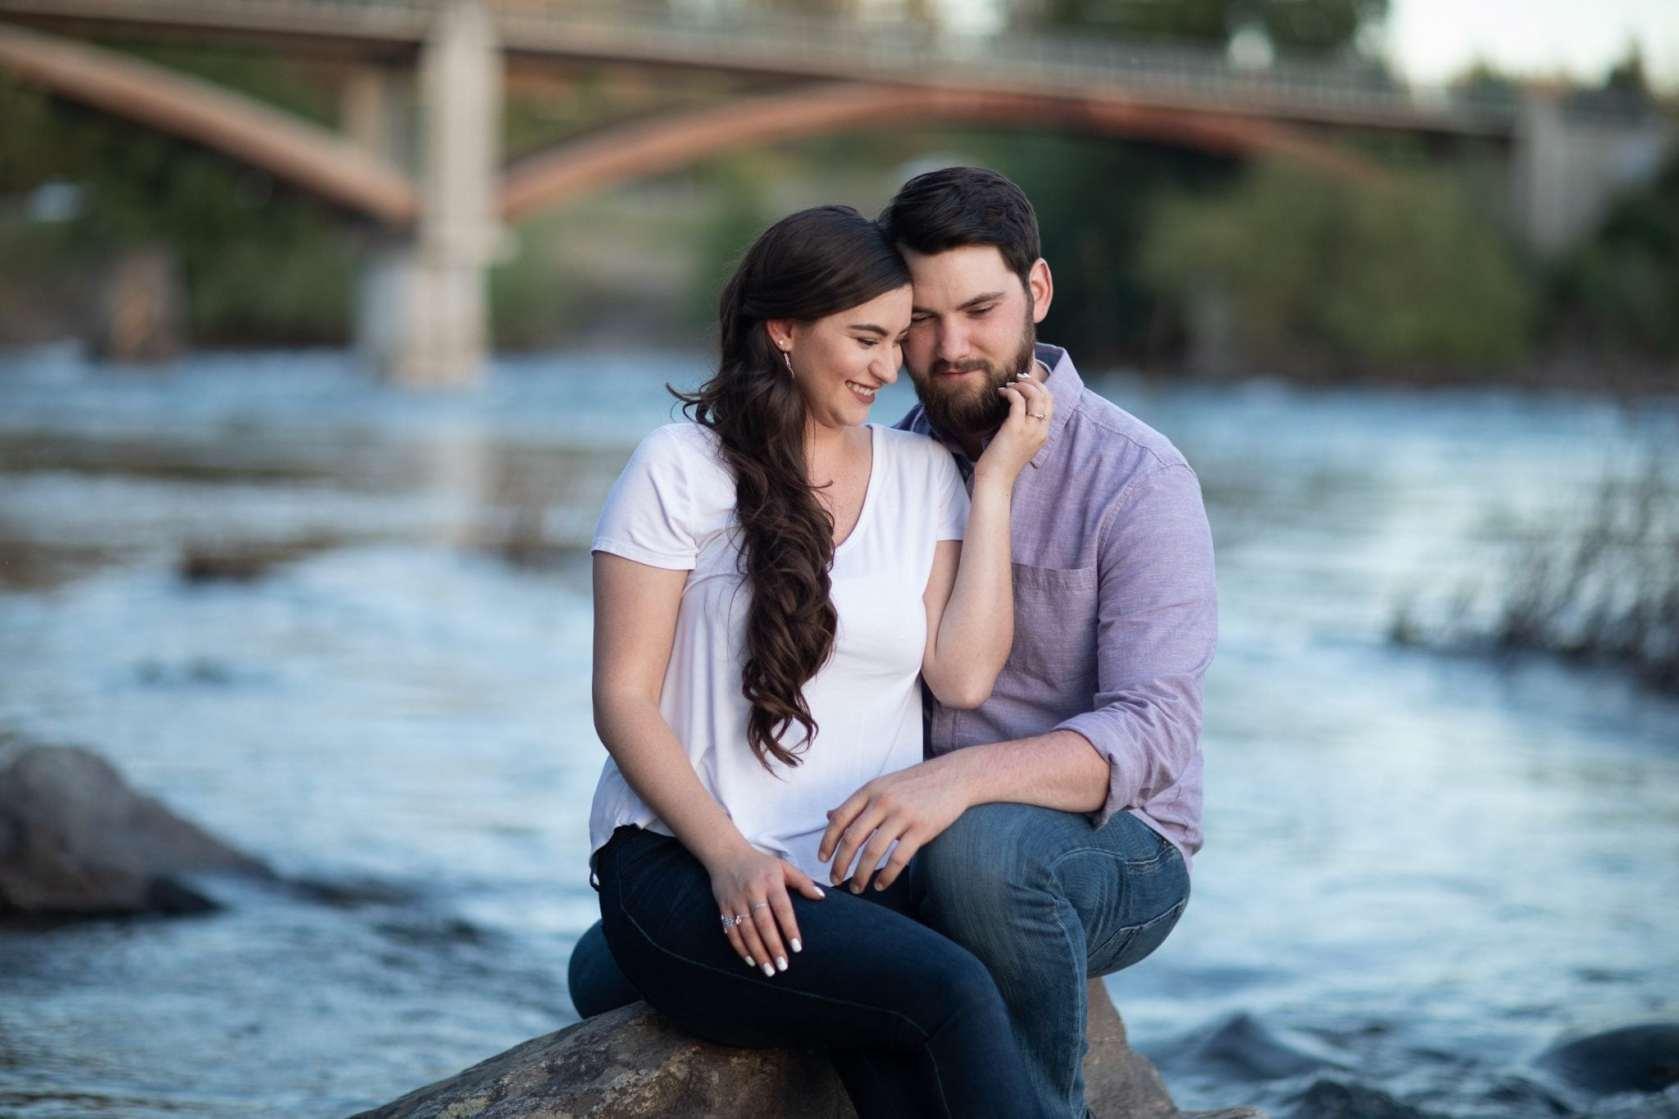 Engagement photos shoot spokane